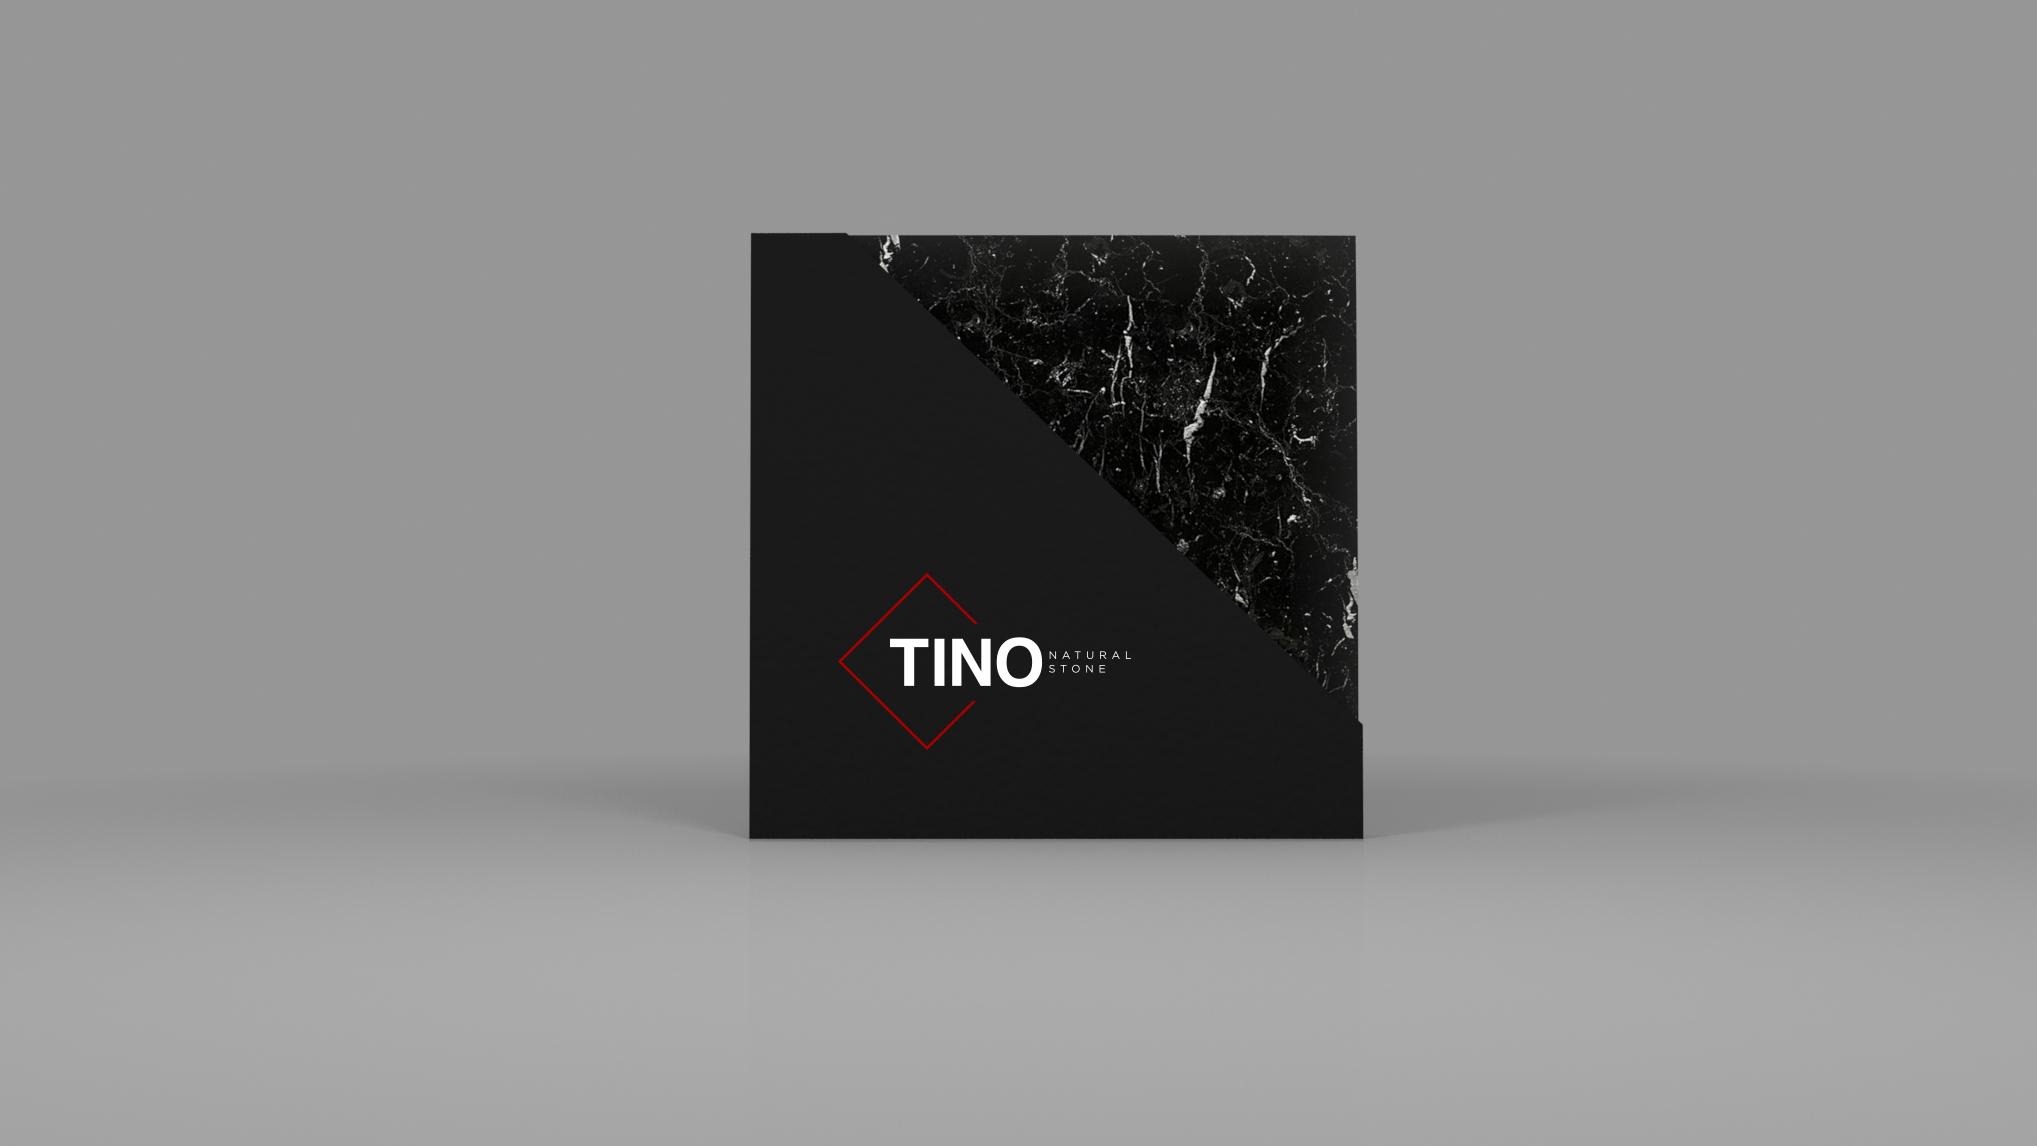 tino packaging